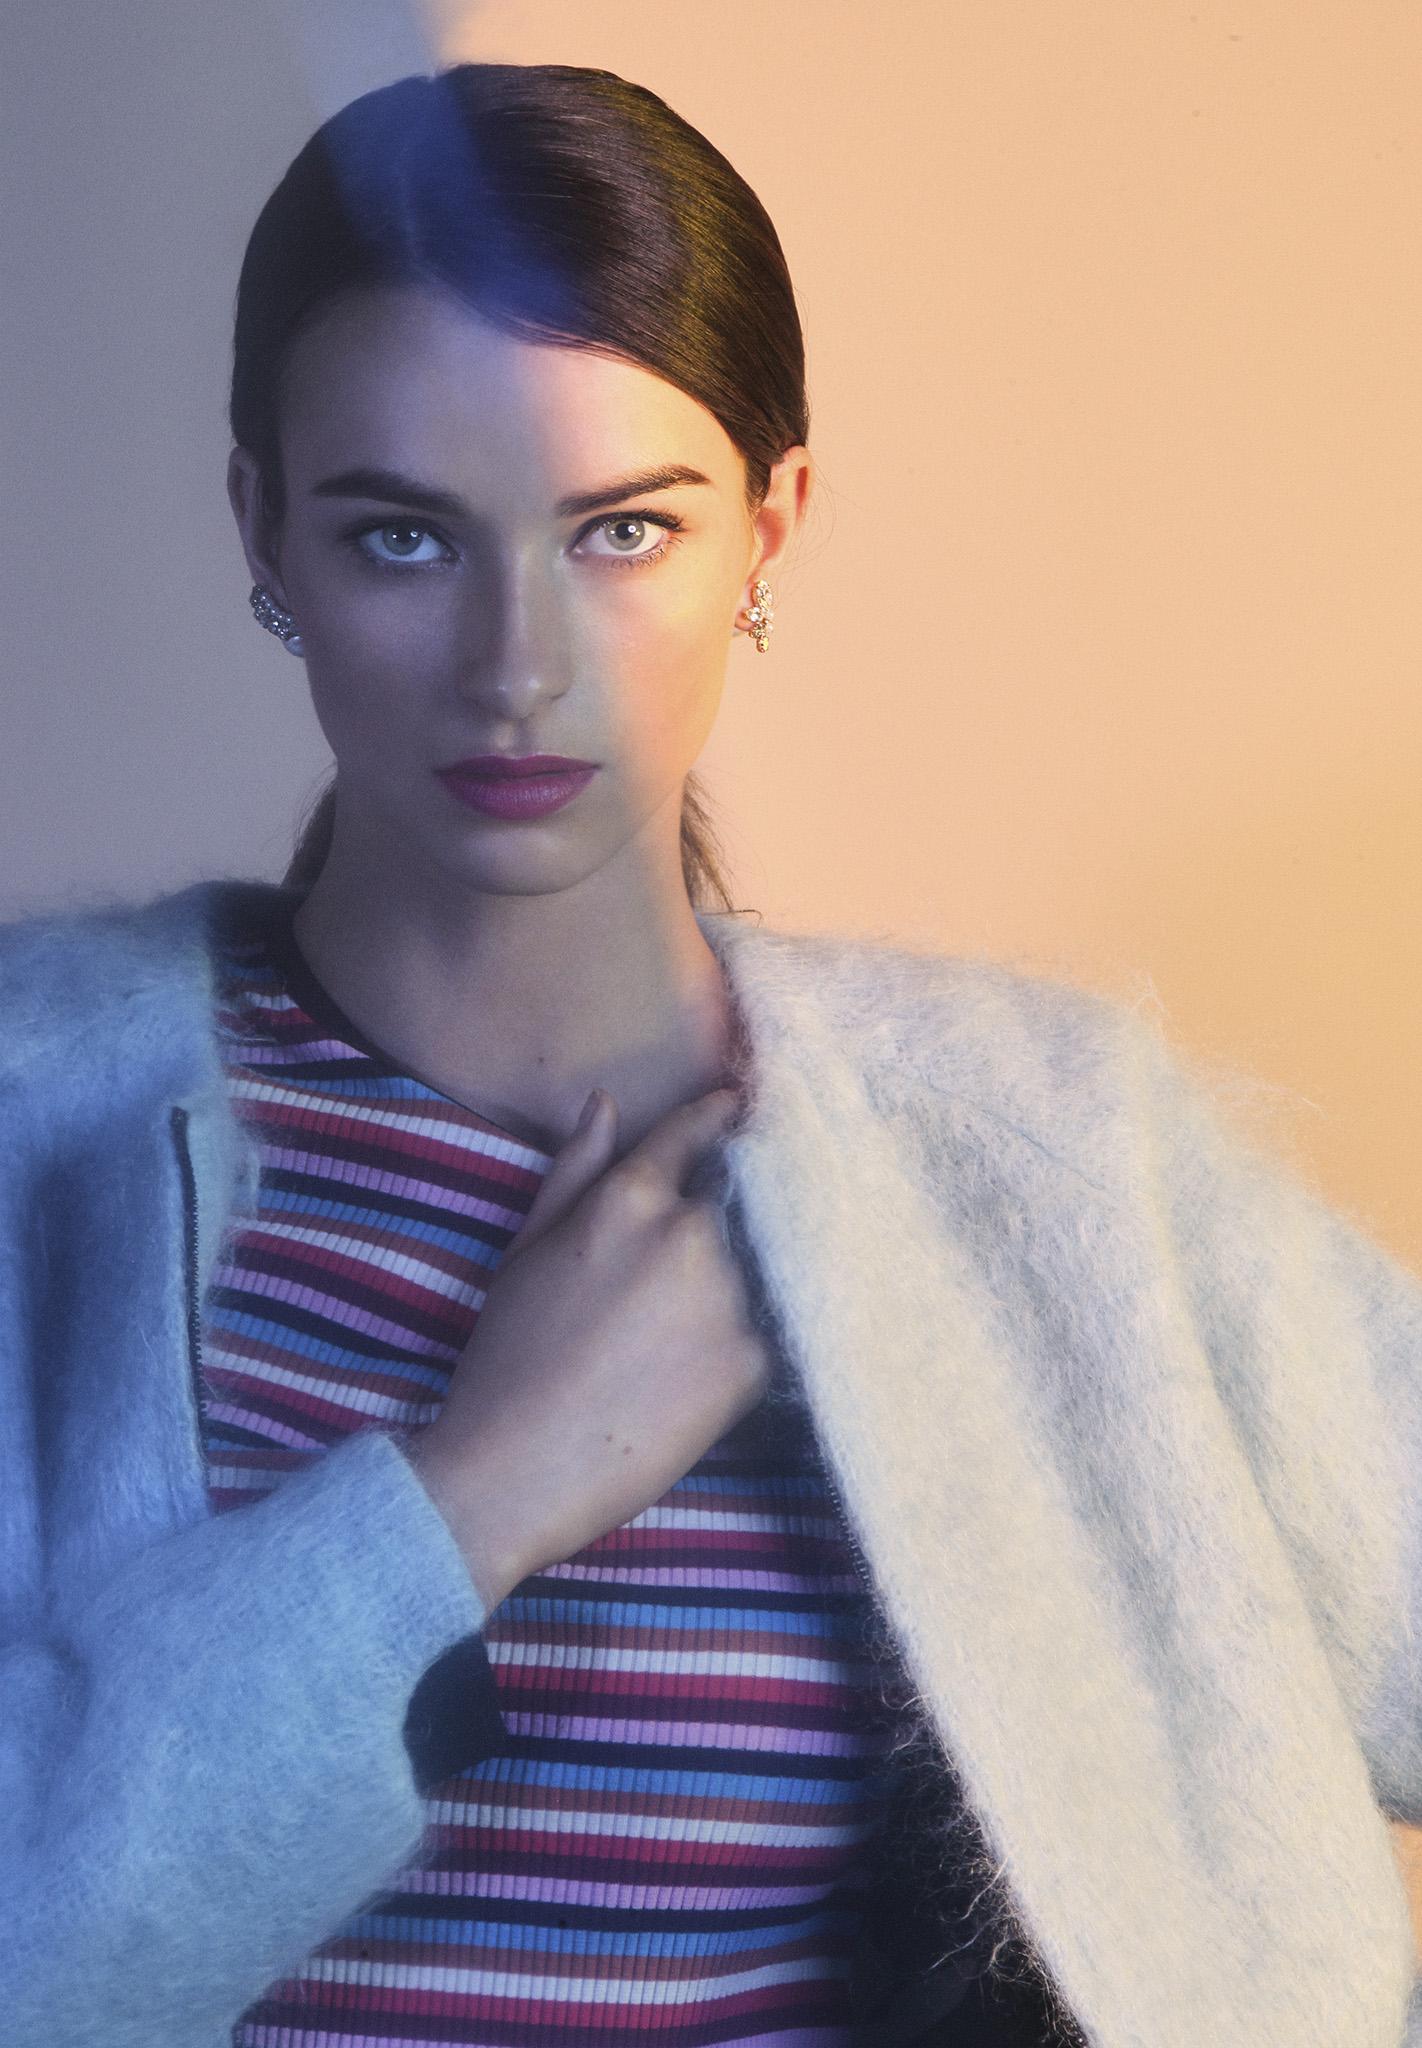 Multi colour short sleeve top  Scotch and Soda   Babay   blue merino wool bomber  Sabinna   Earring  Mayu Pearl x Crystal mix Swarovski  & white pearl rivet pierced earring